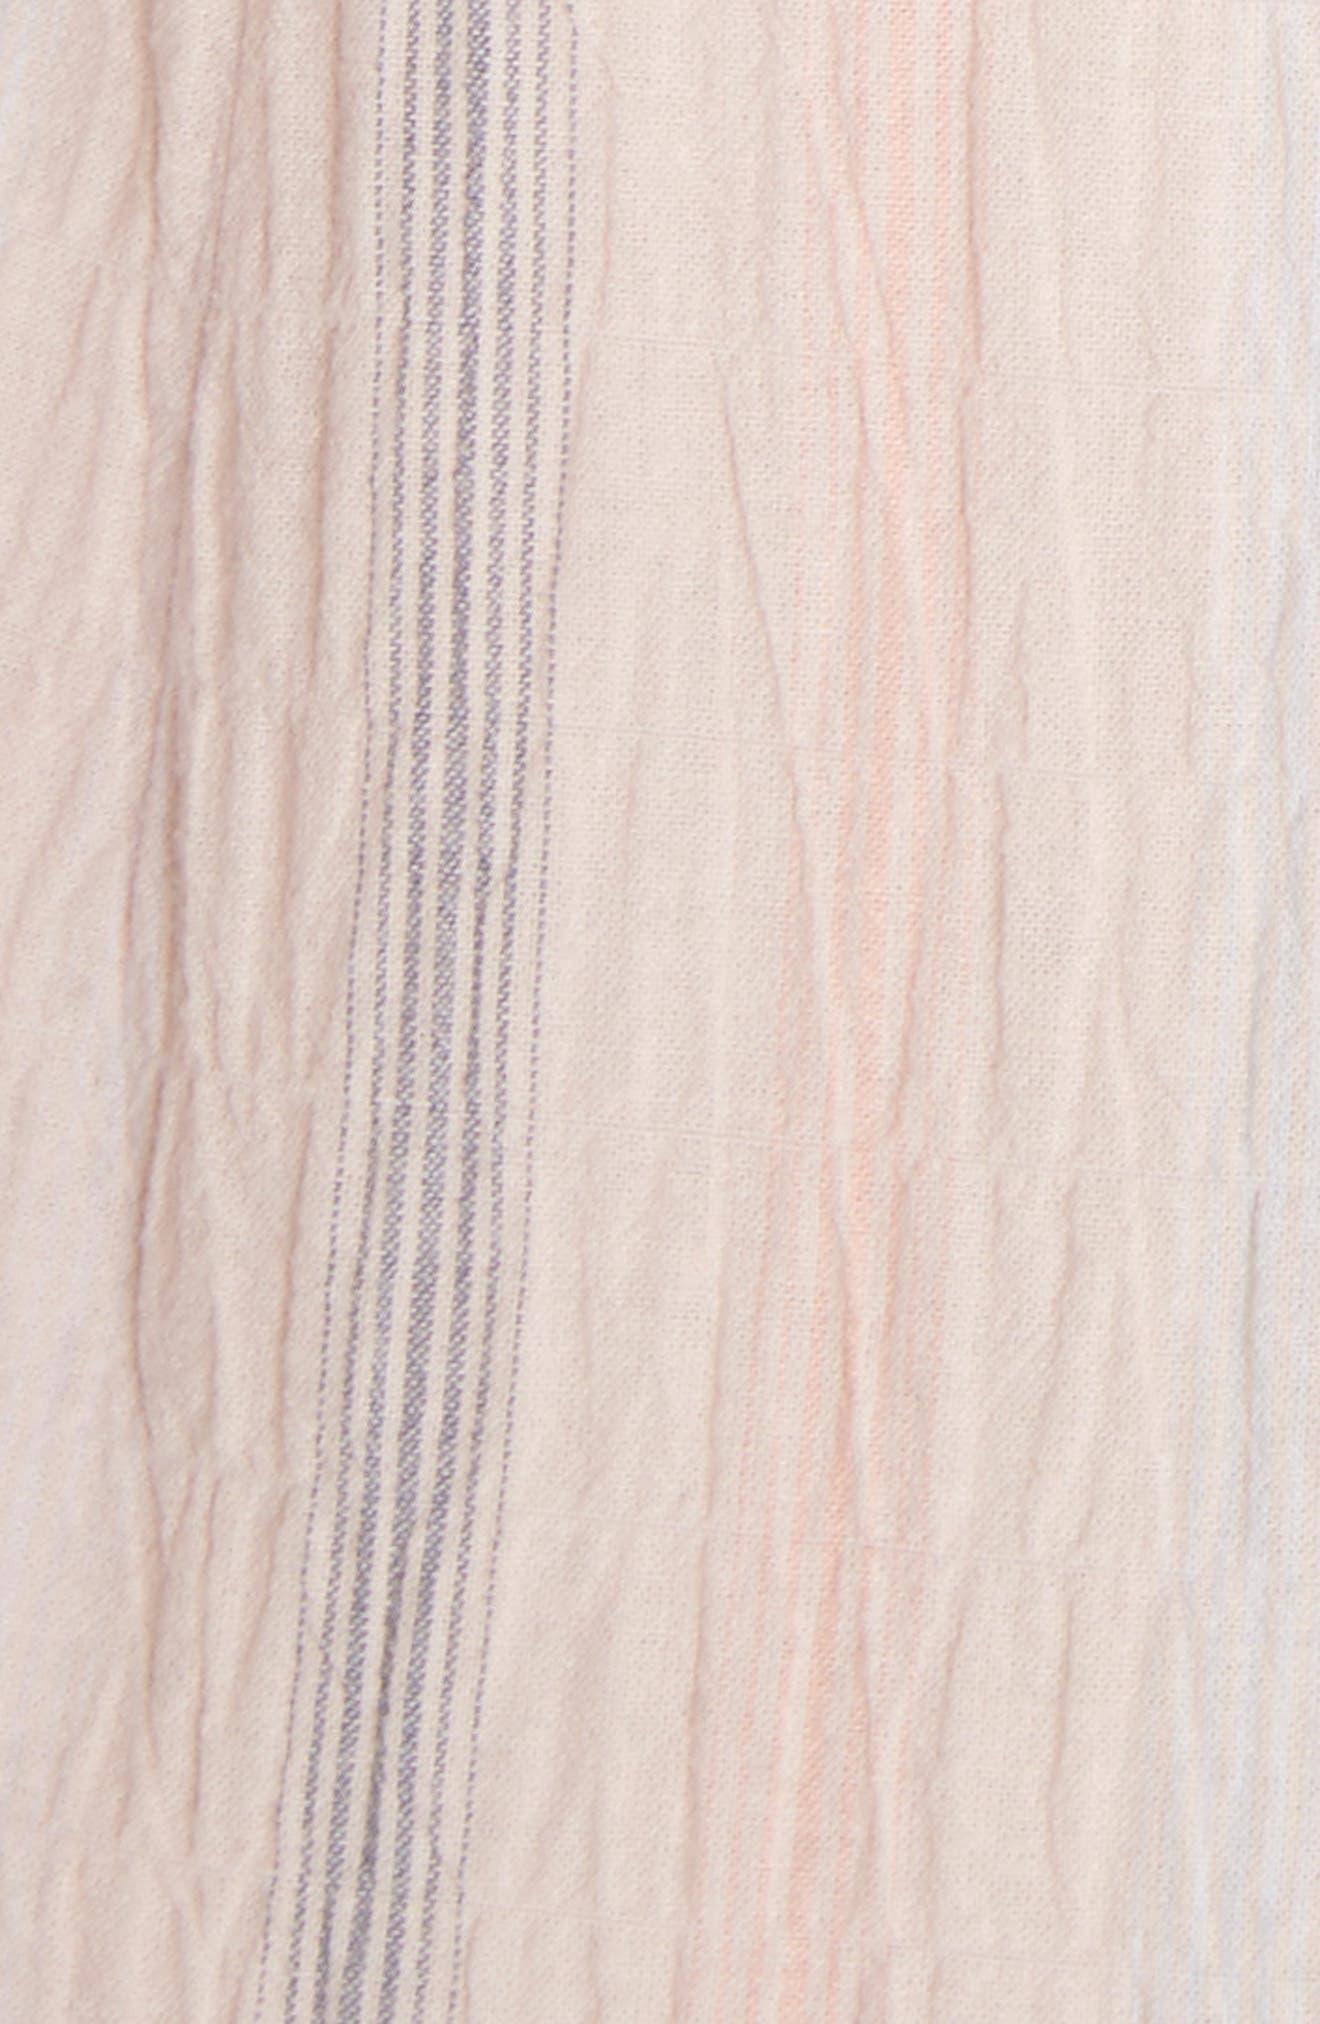 Stripe Ruffle Cap Sleeve Dress,                             Alternate thumbnail 5, color,                             Ballet Combo